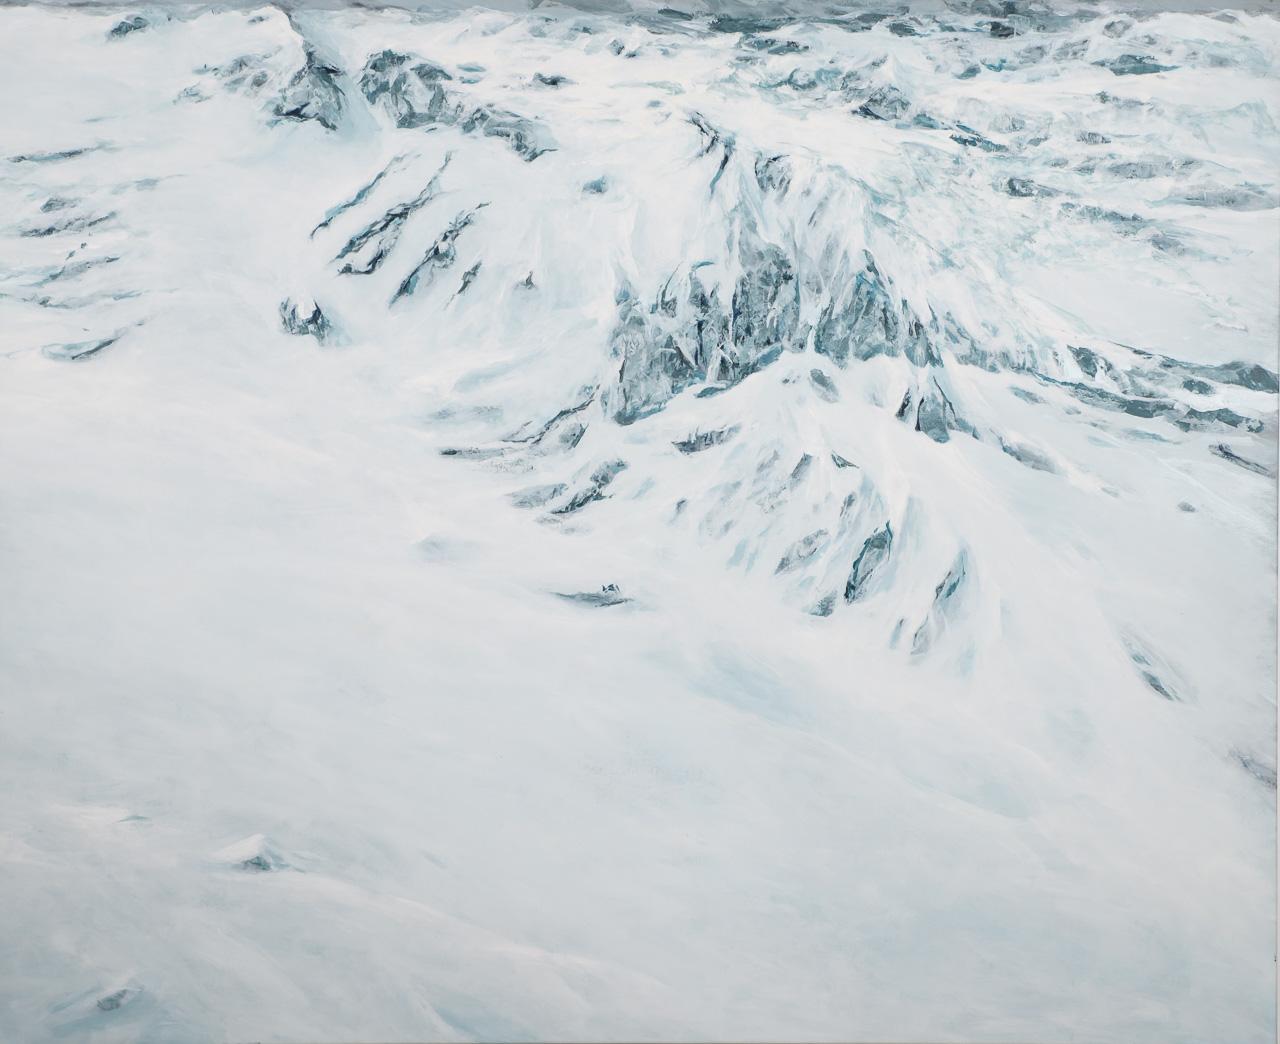 Gletscherland I Langfluh Saas-Fee